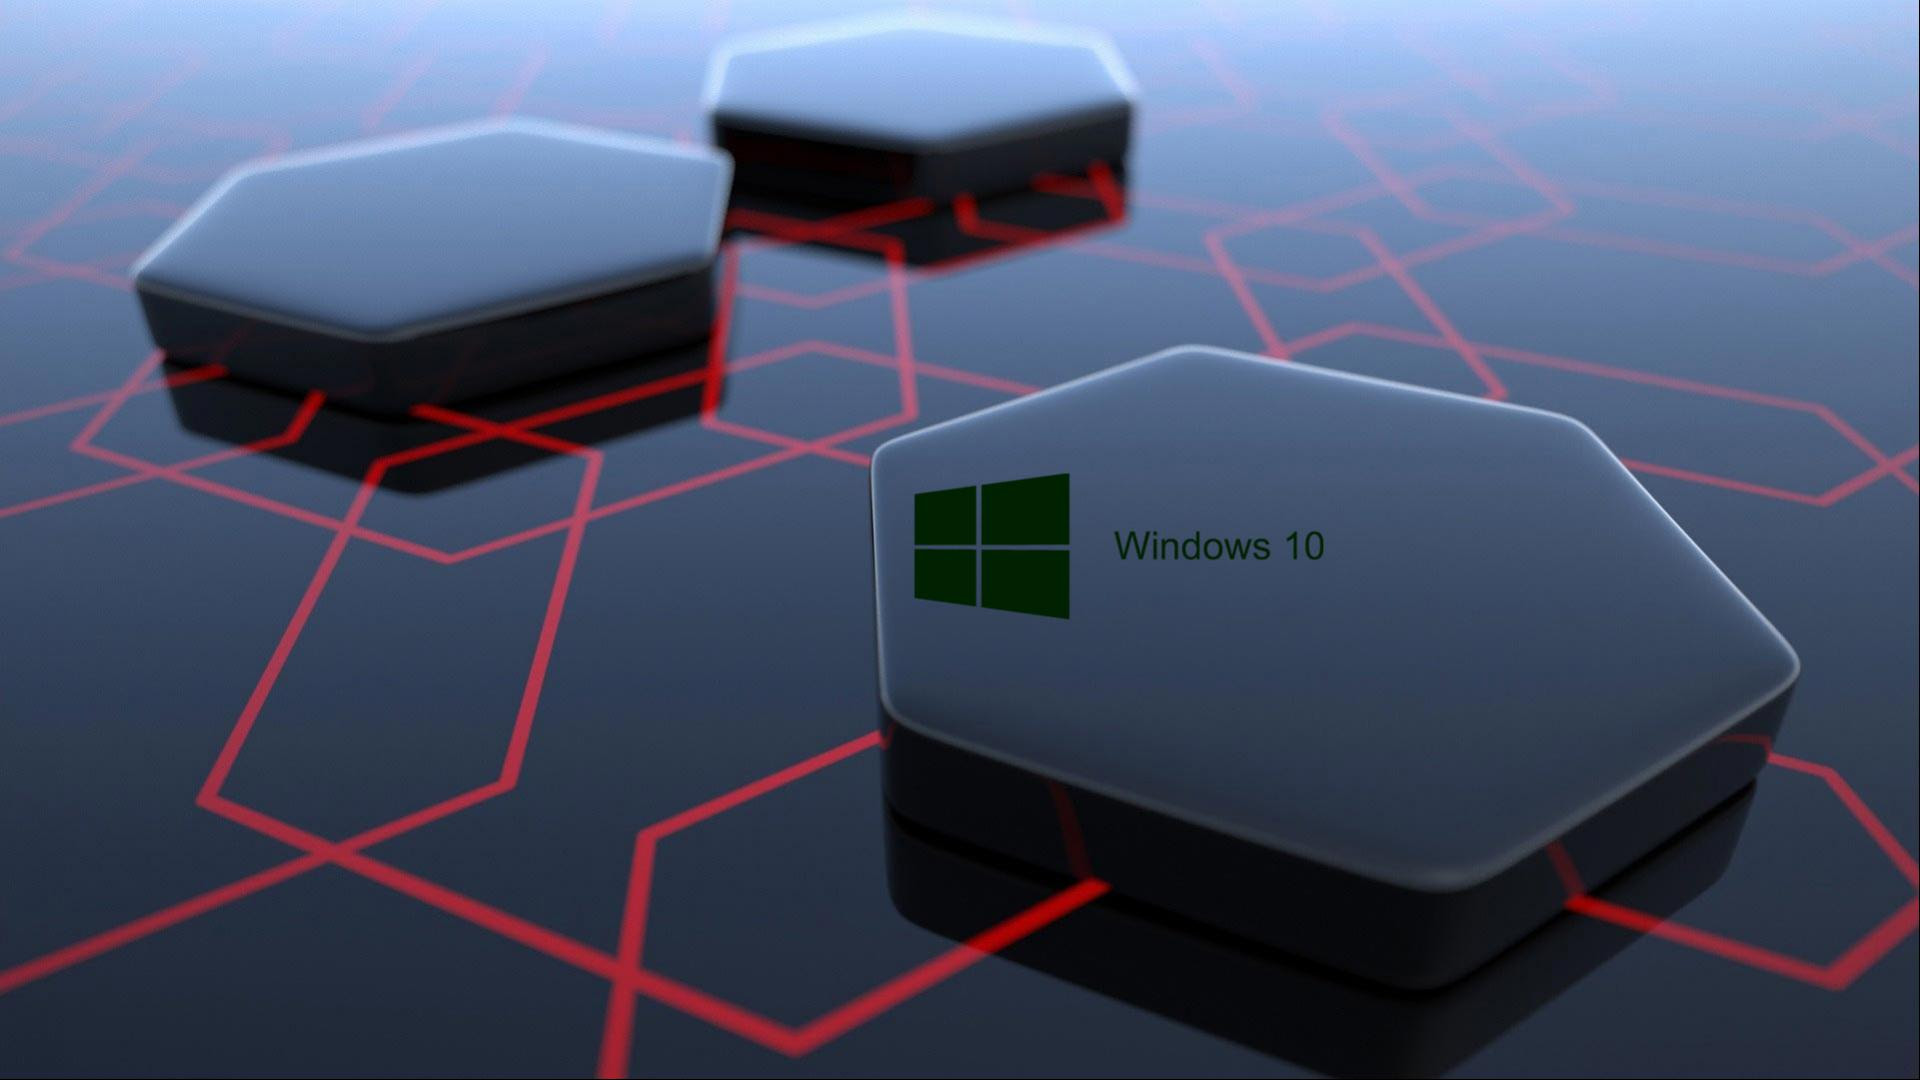 Gambar Wallpaper Untuk Windows 10 Terlengkap - A1 ...